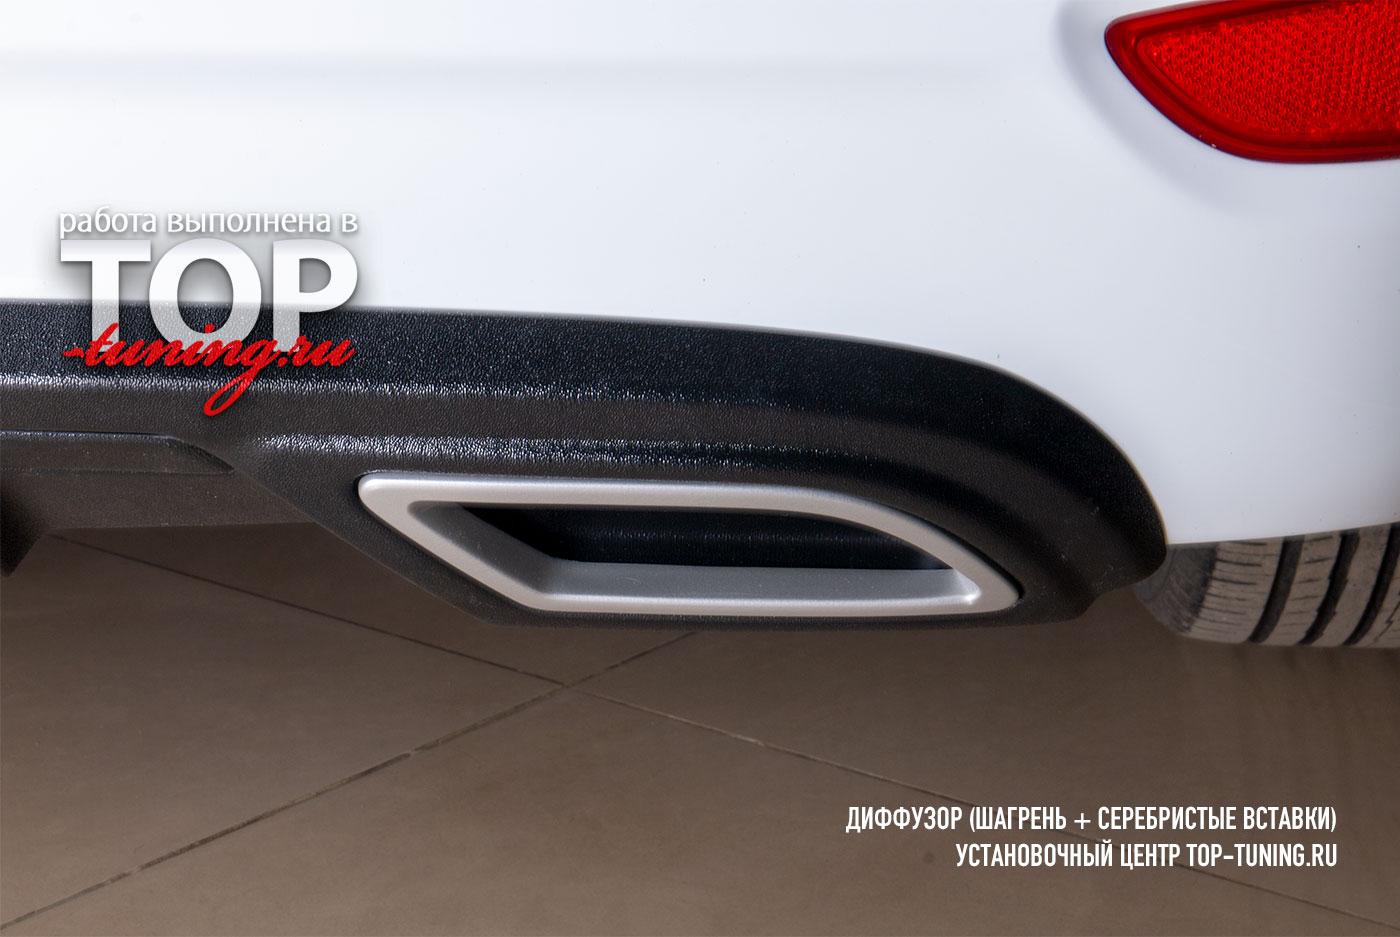 4665 Диффузор RS на задний бампер для Hyundai Solaris 1